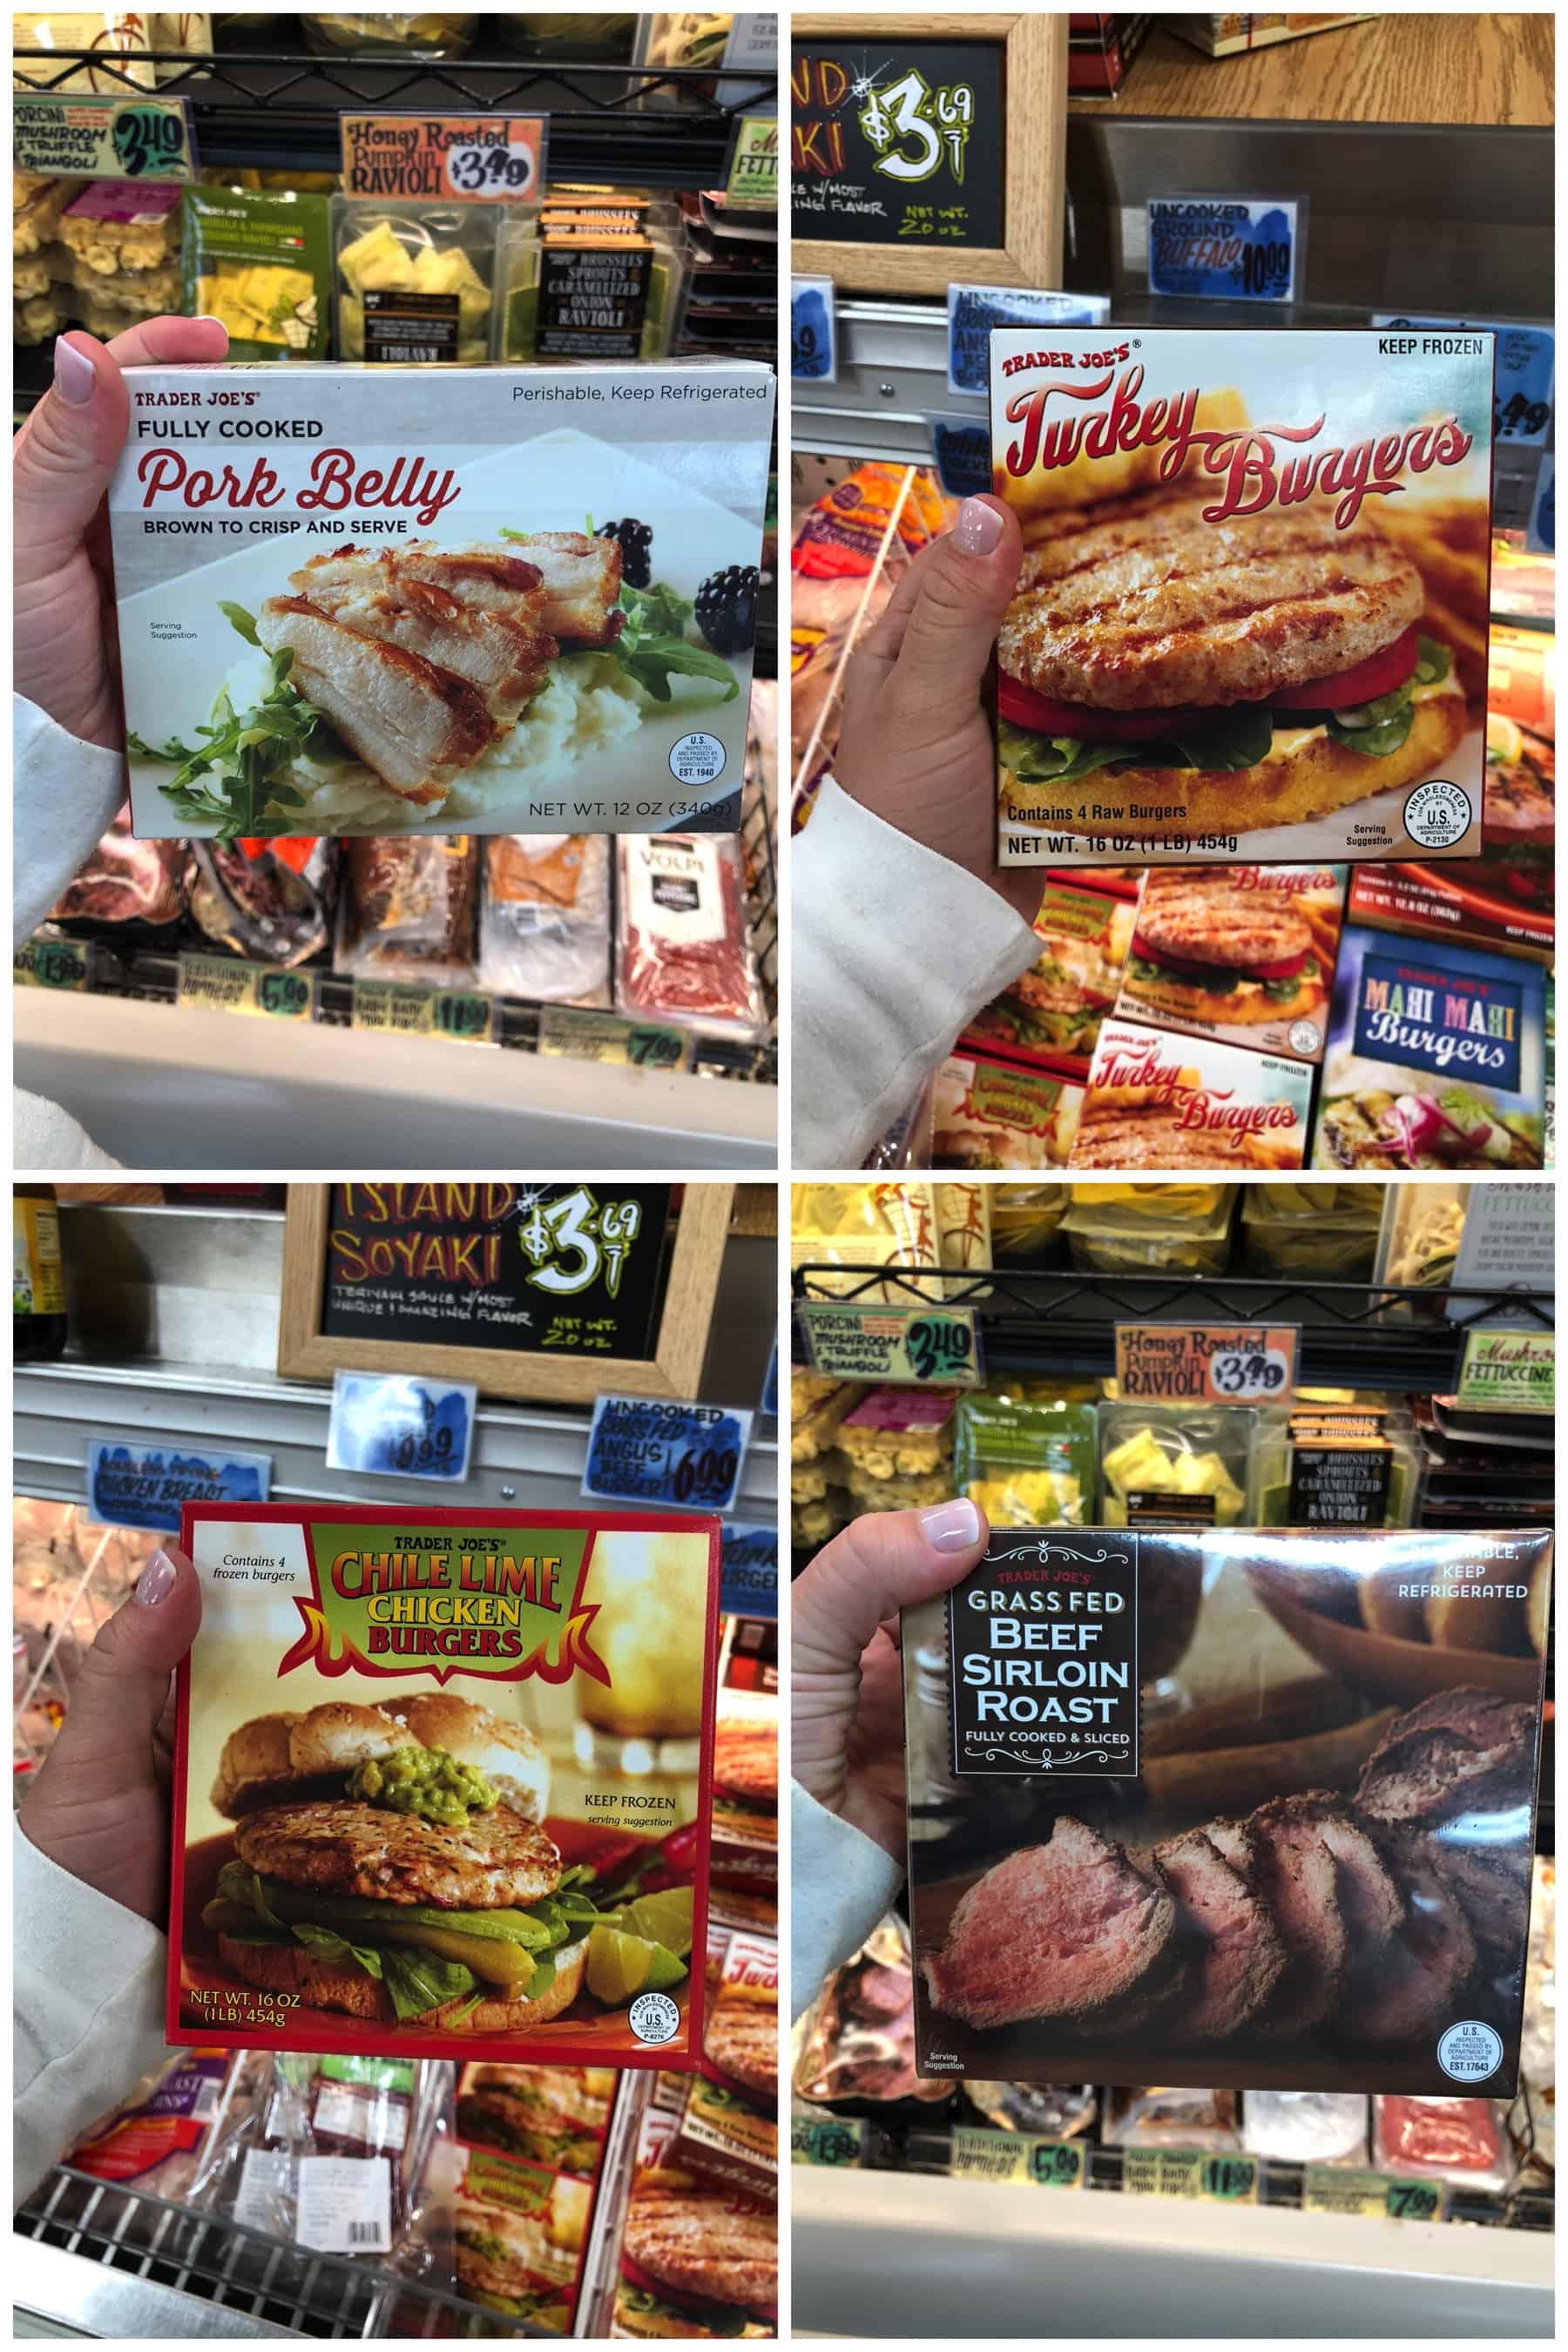 Trader Joe's Convenience meats